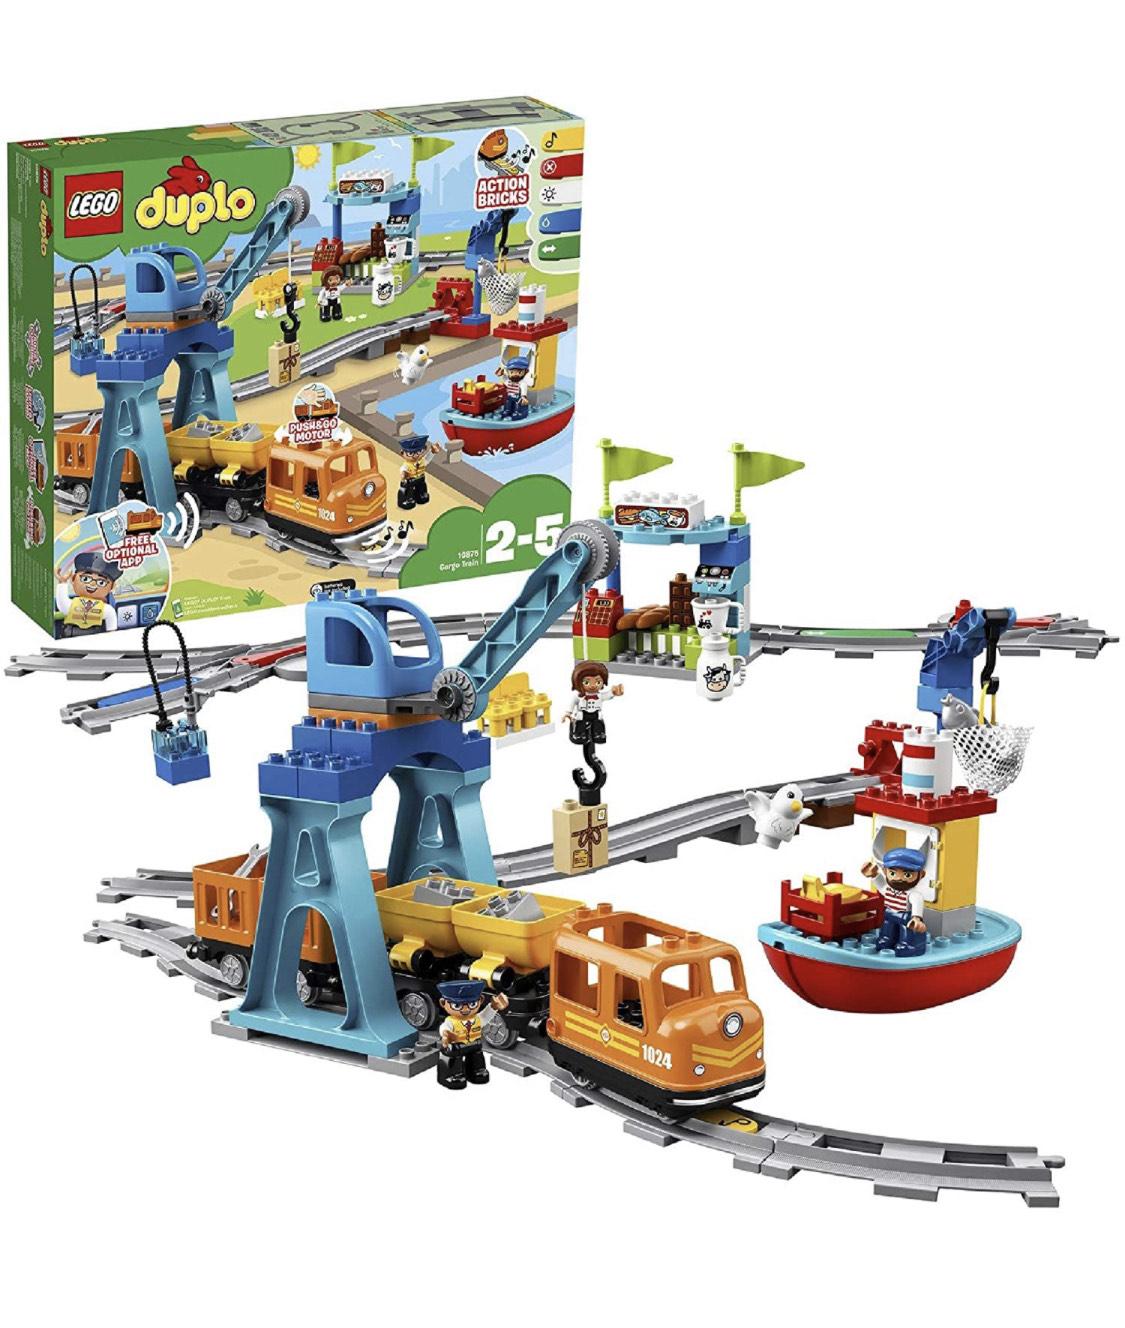 Lego 10875 Duplo Cargo Train £51.43 @ Amazon